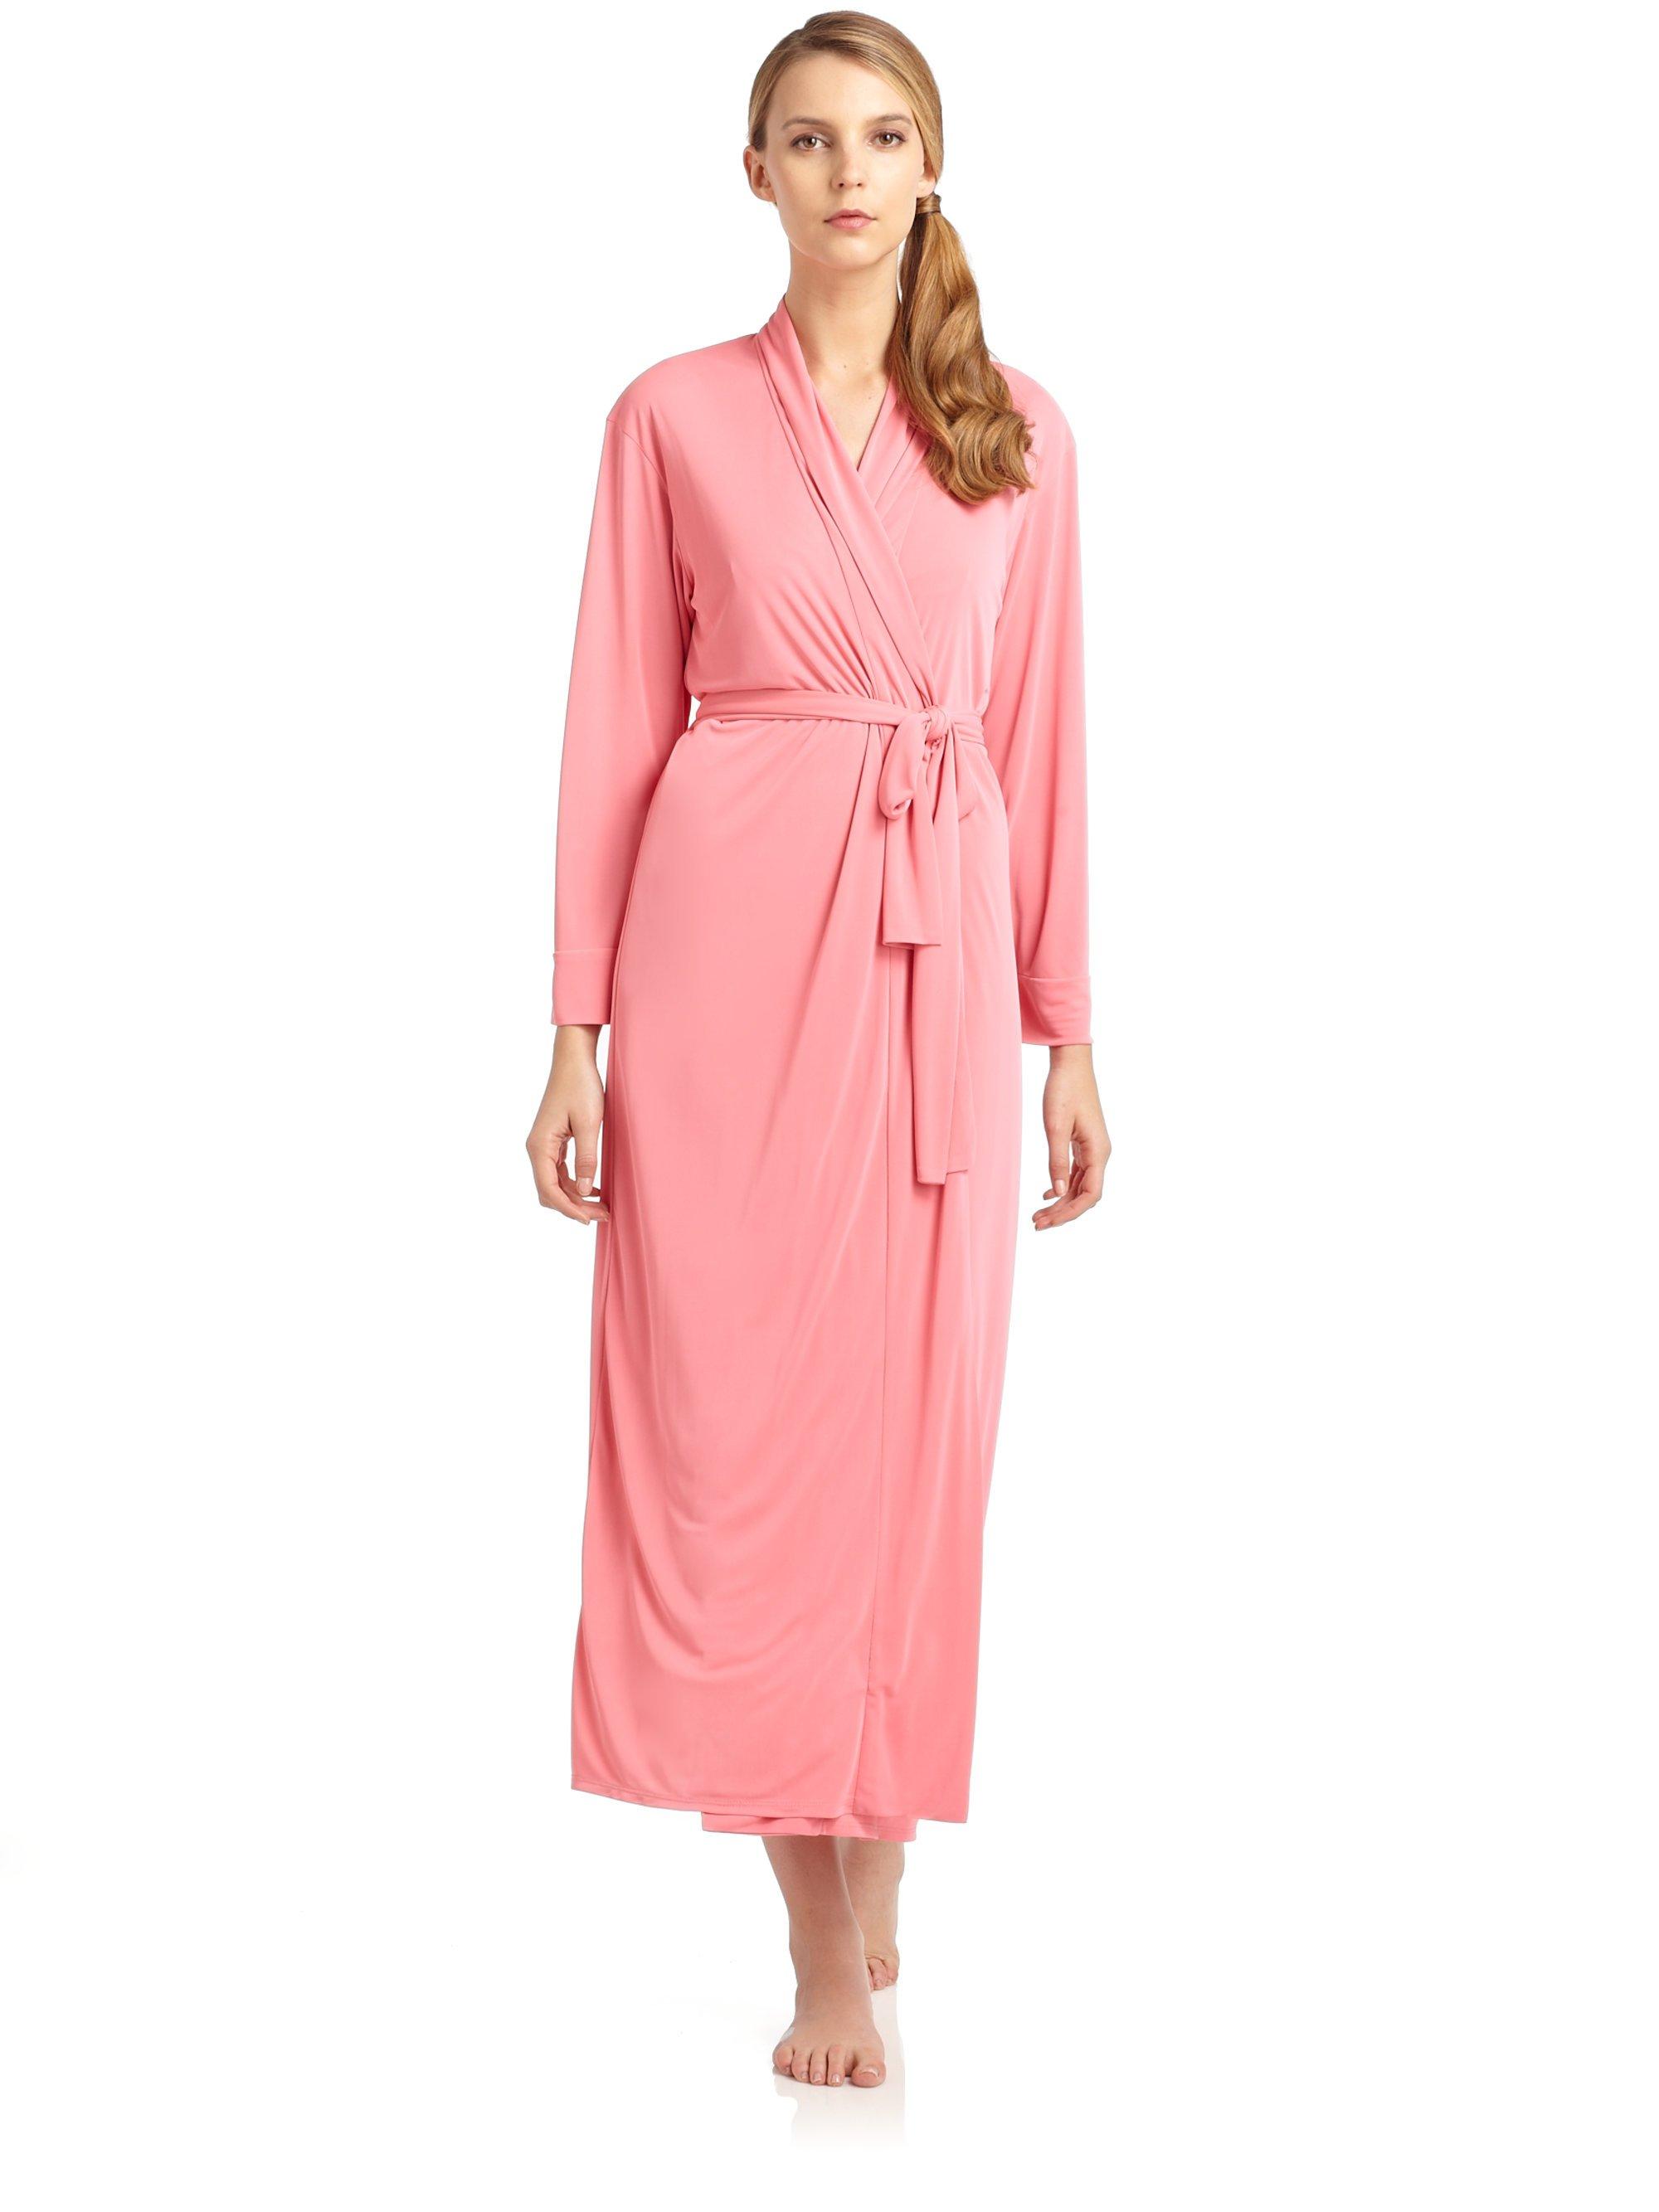 Natori aphrodite robe in pink salmon pink lyst for Robes de mariage de betsey johnson